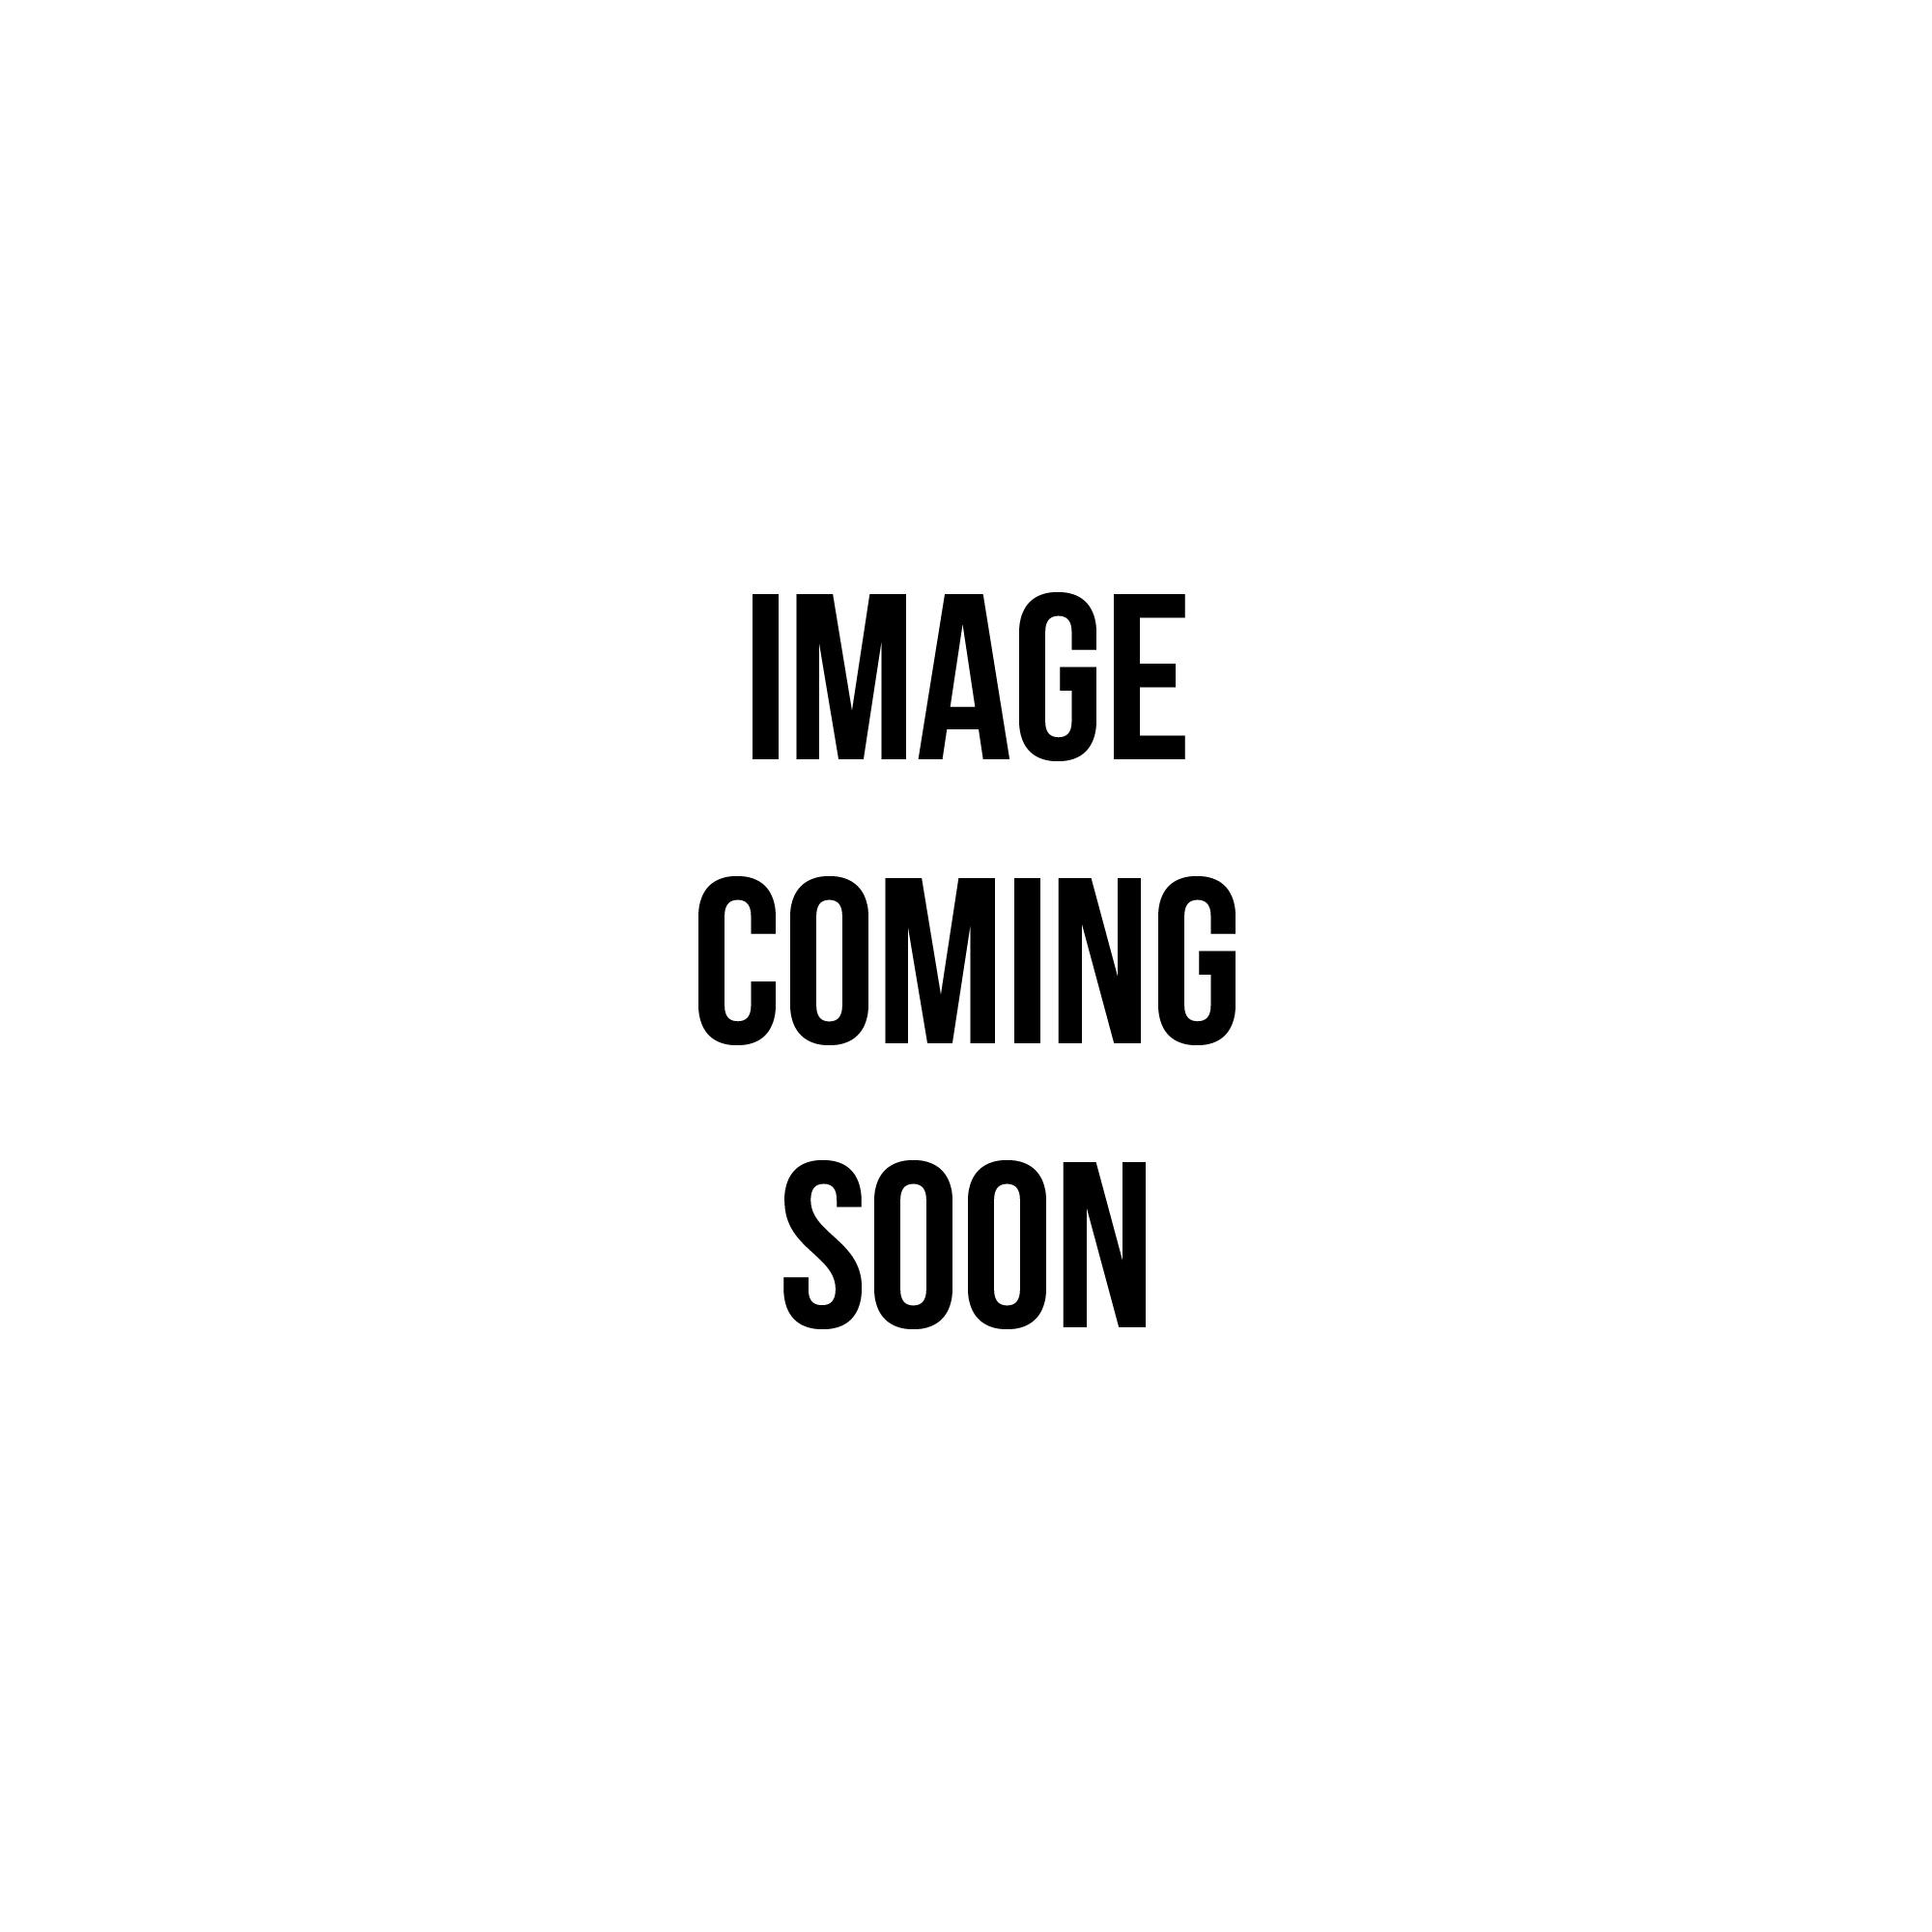 amazone jeu jeu avec mastercard Nike Glisse Femmes 2015 nouvelle vente bas prix mGwHQA3V6